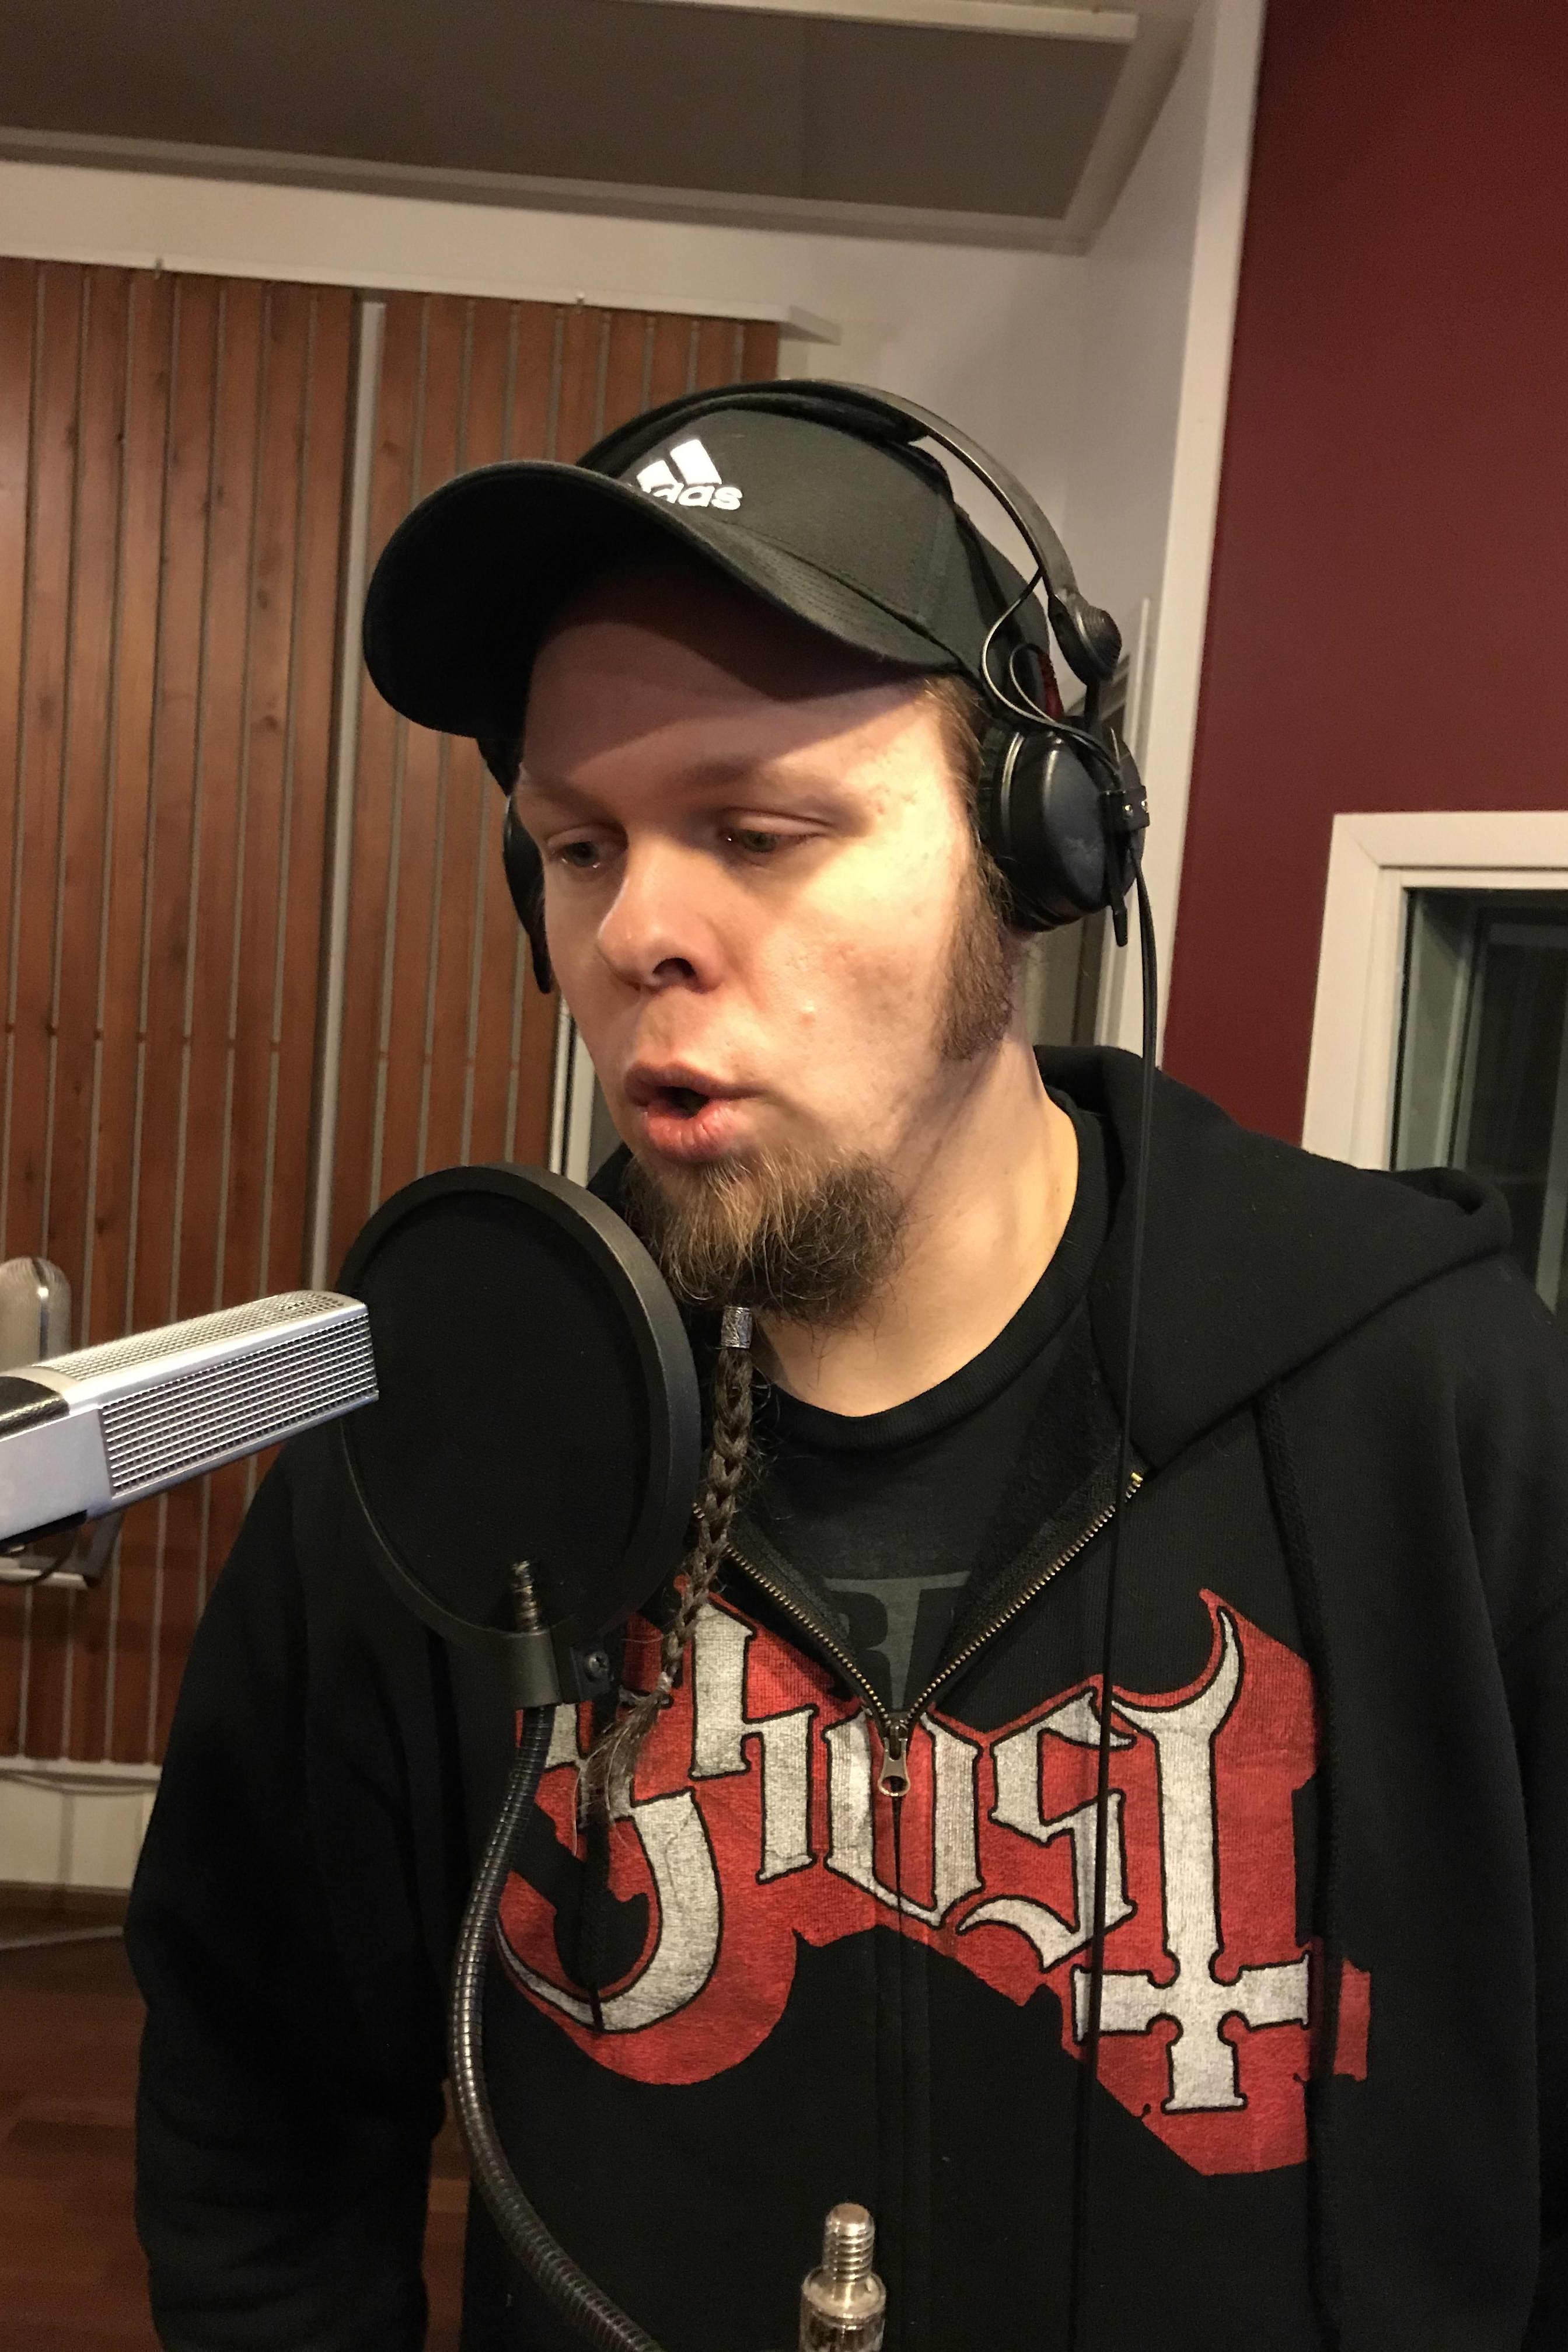 Mies laulaa mikrofoniin.